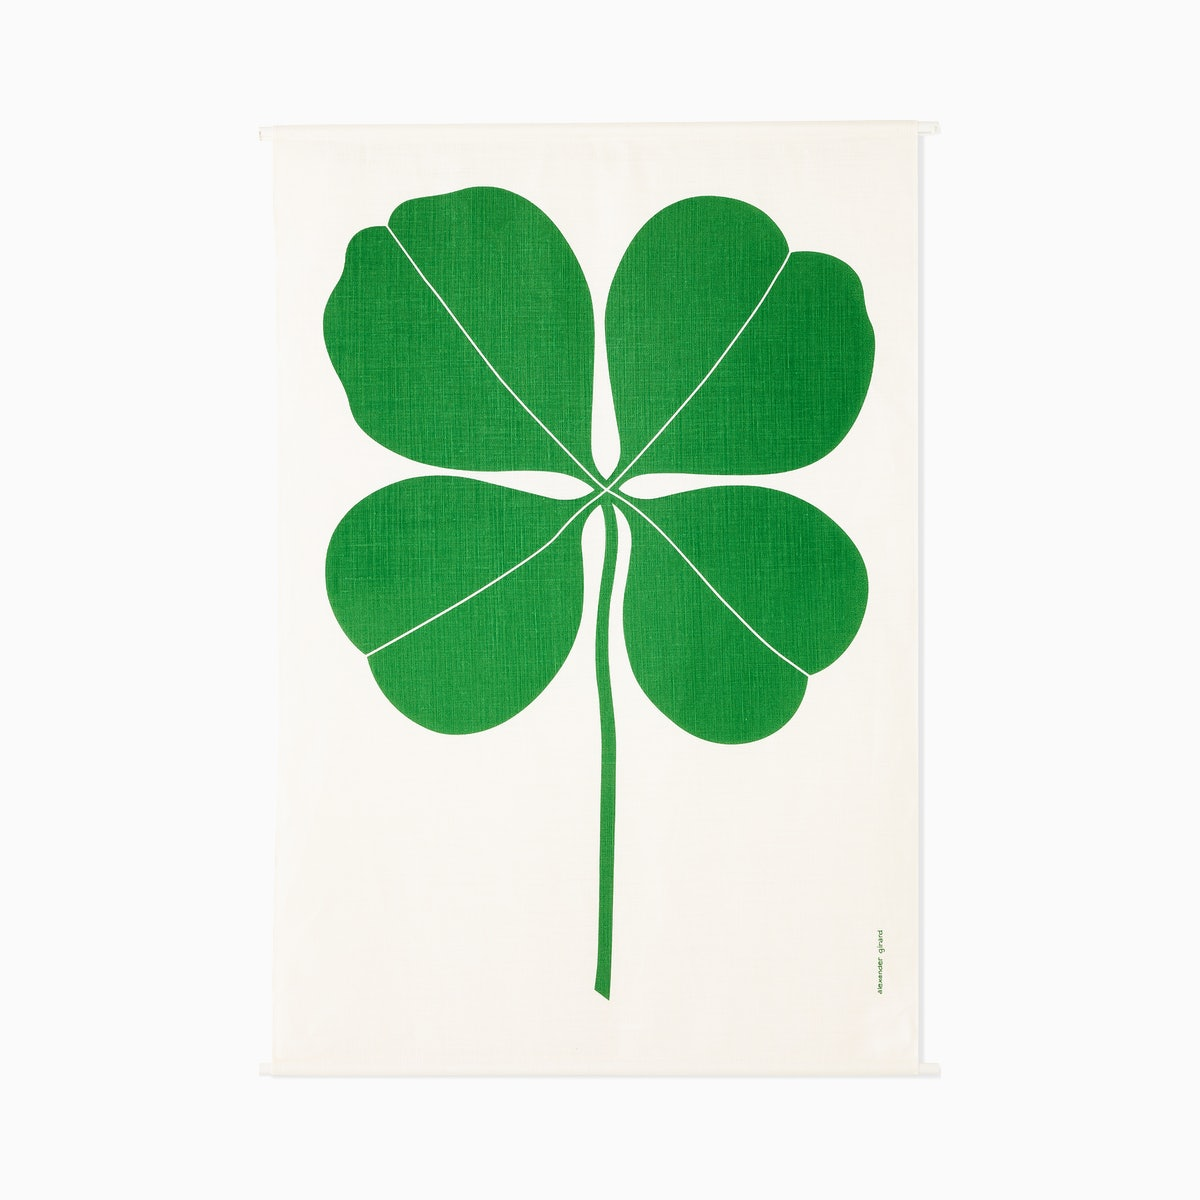 """Four Leaf Clover"" by Alexander Girard"